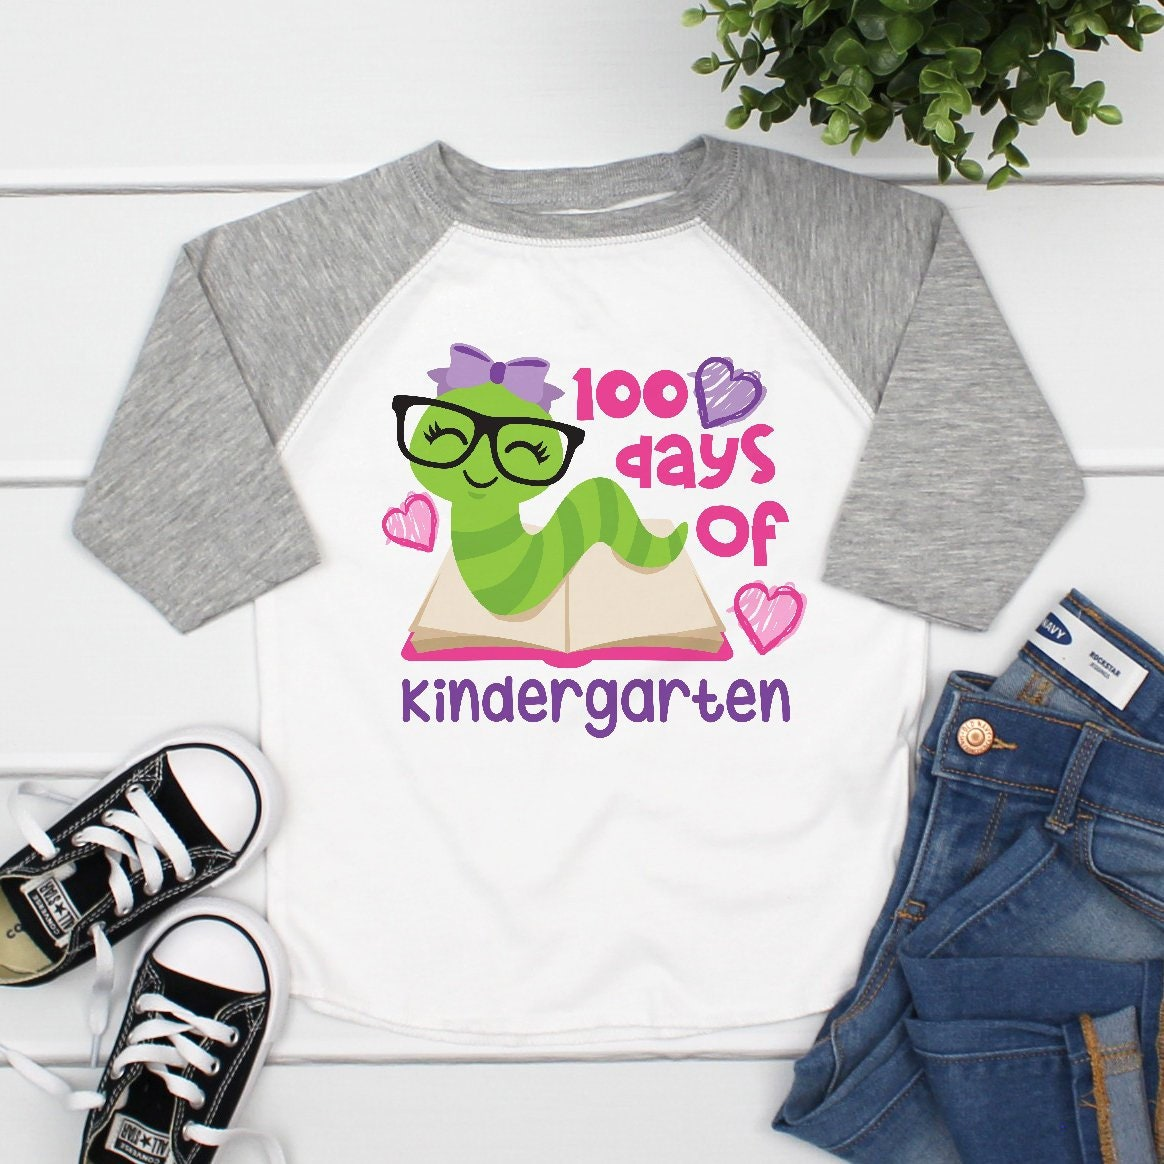 il fullxfull.1710264297 3ctu - 100 Days Of Kindergarten